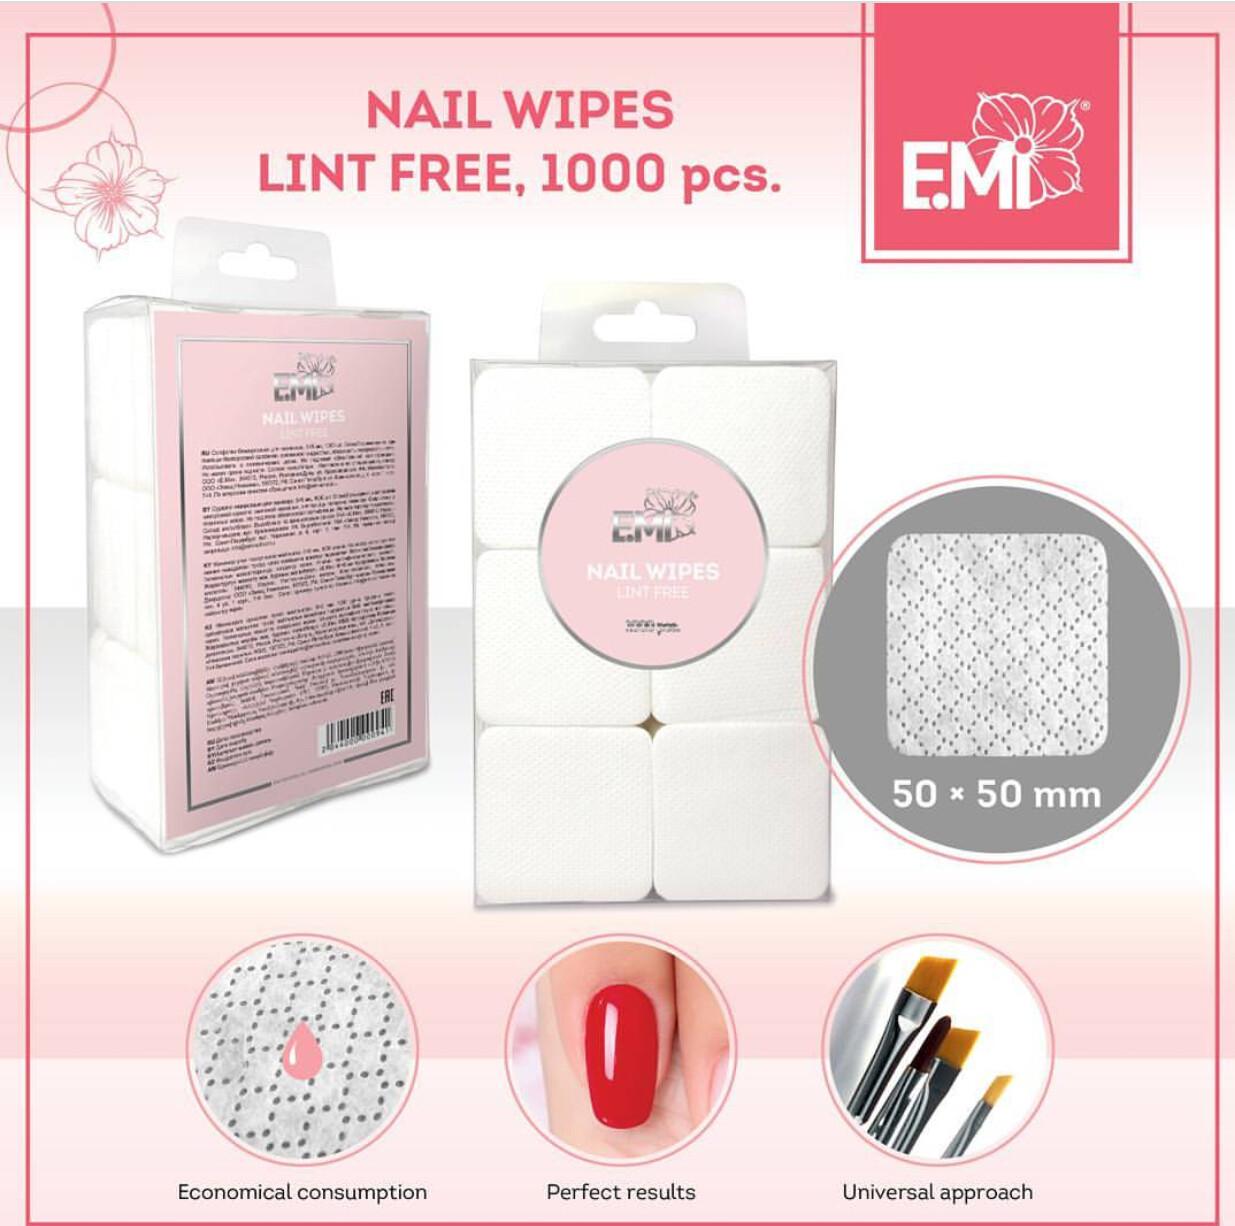 Nail Wipes Lint Free, 1000 pcs